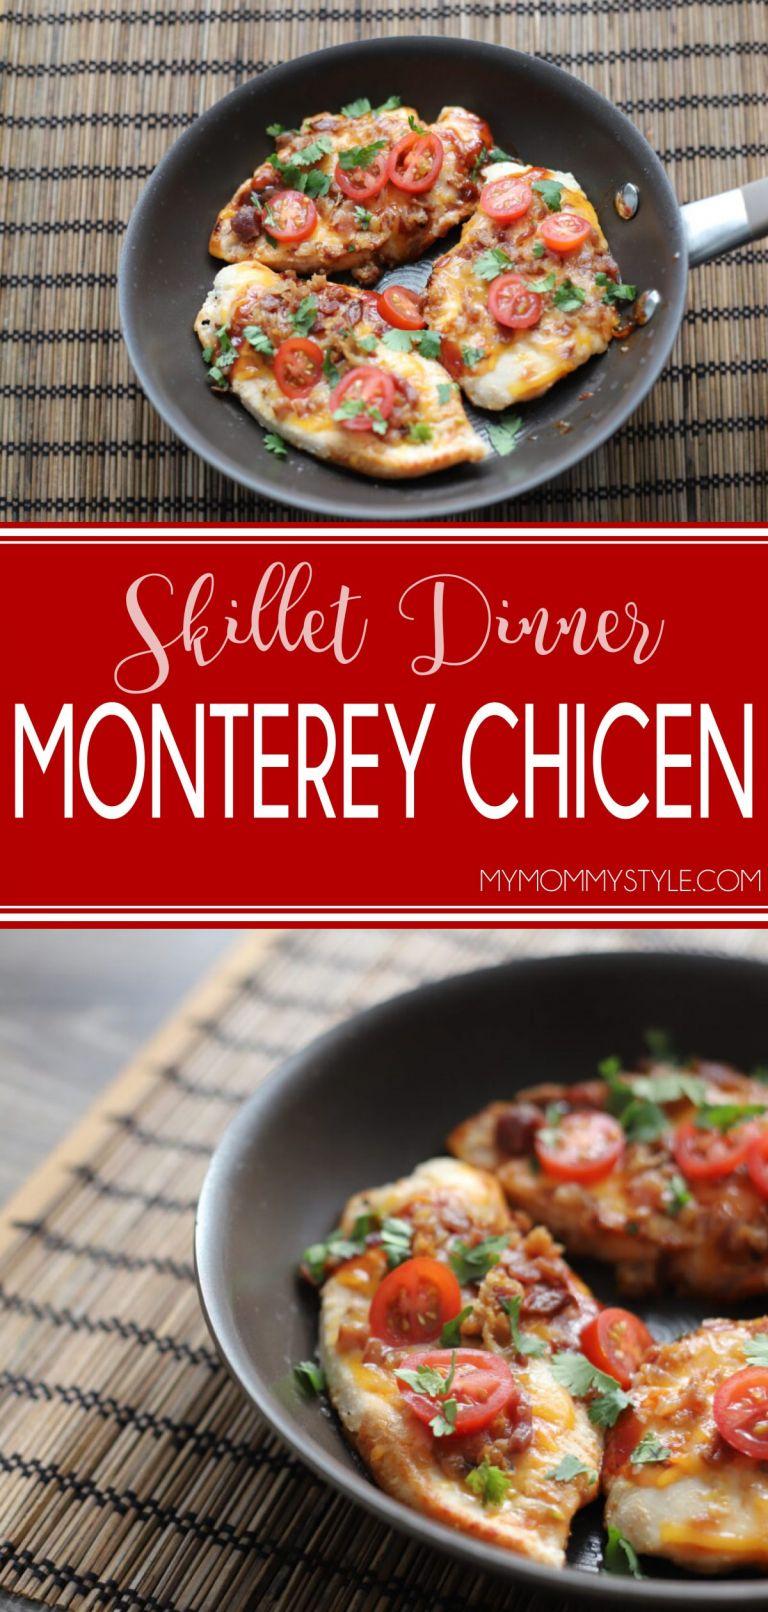 Heart Healthy Recipes of Monterey chicken skillet dinner